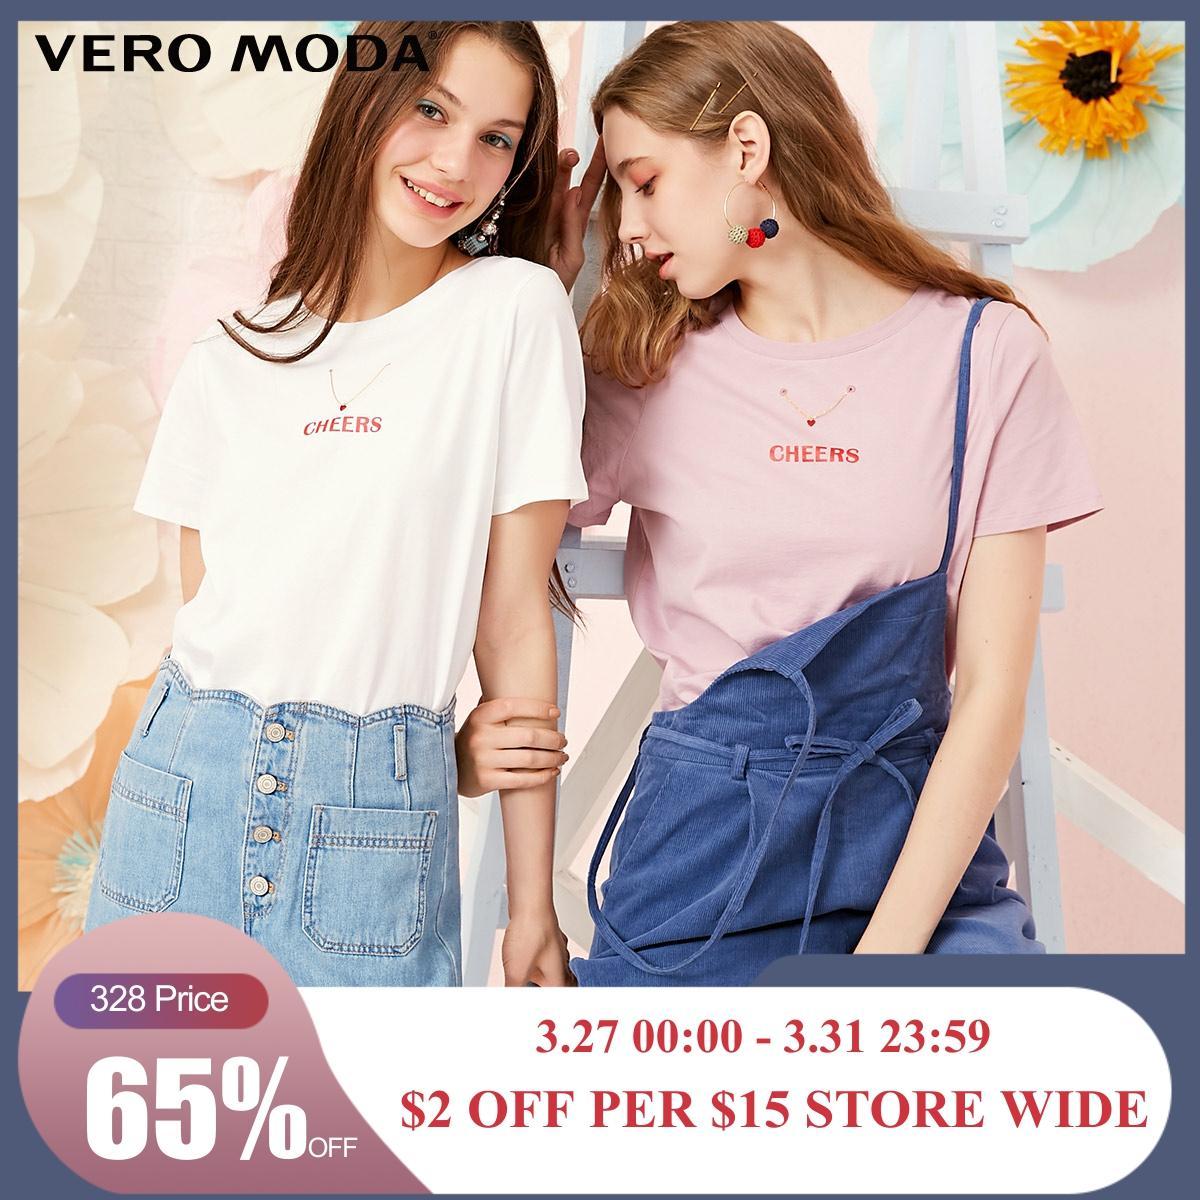 Vero Moda Women's 100% Cotton Short-Sleeved T-Shirt | 319101544